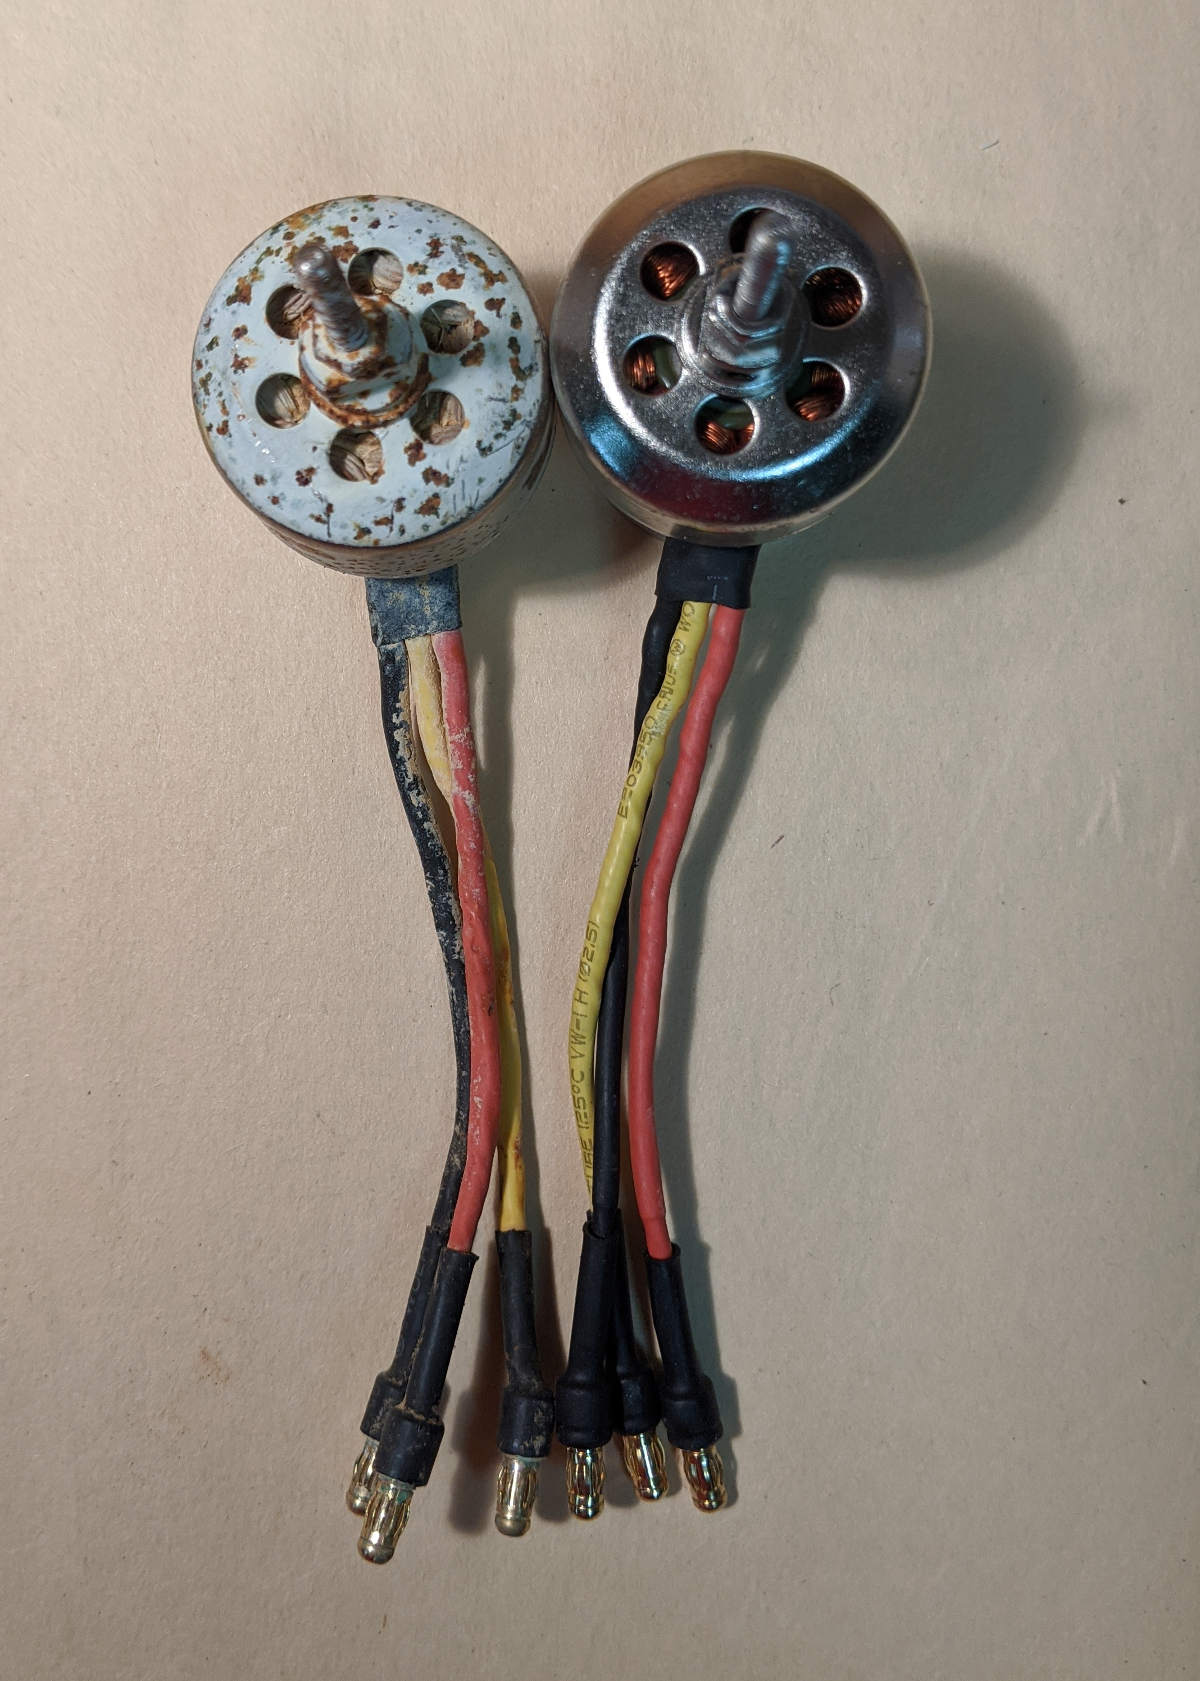 Brushless motors rusted